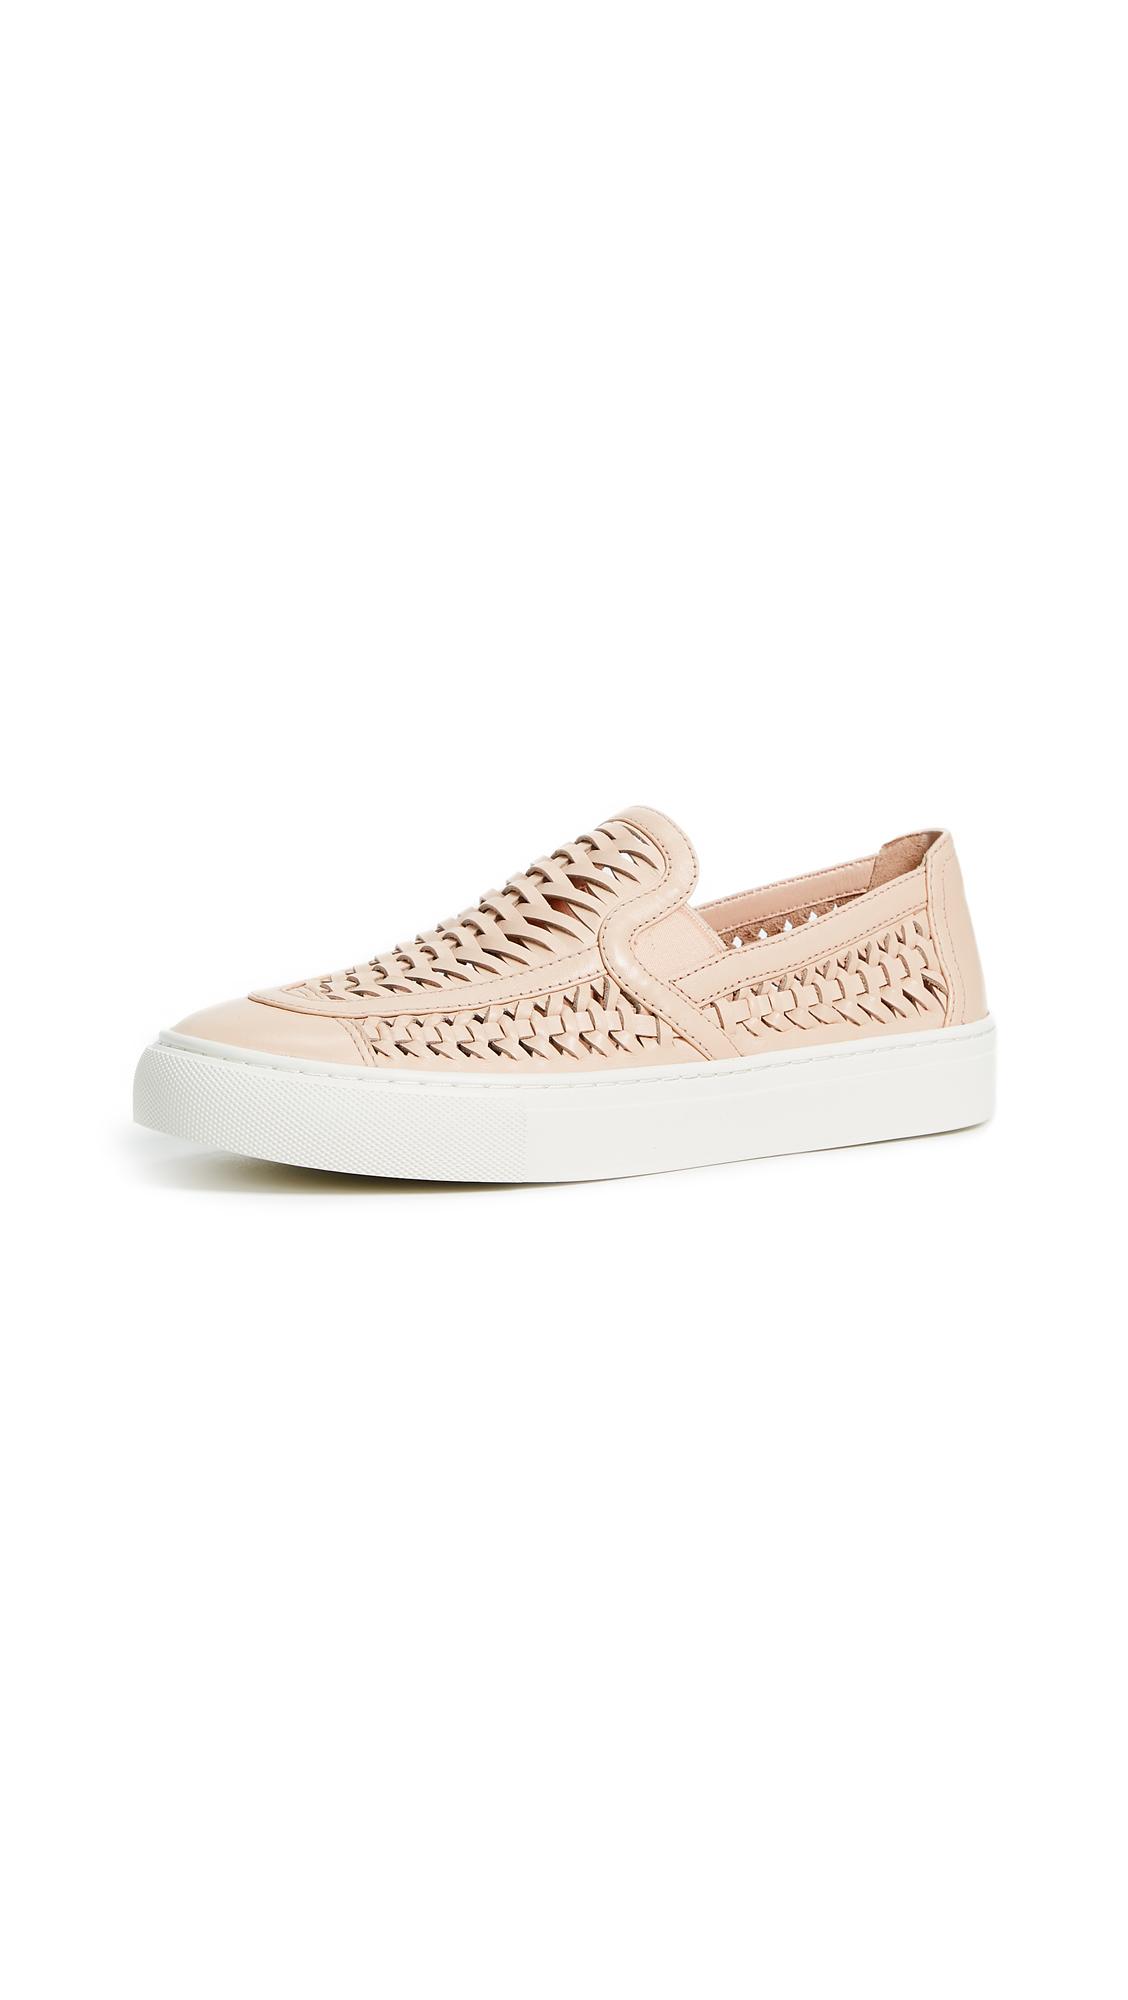 Tory Burch Huarache 2 Slip On Sneakers - Perfect Blush